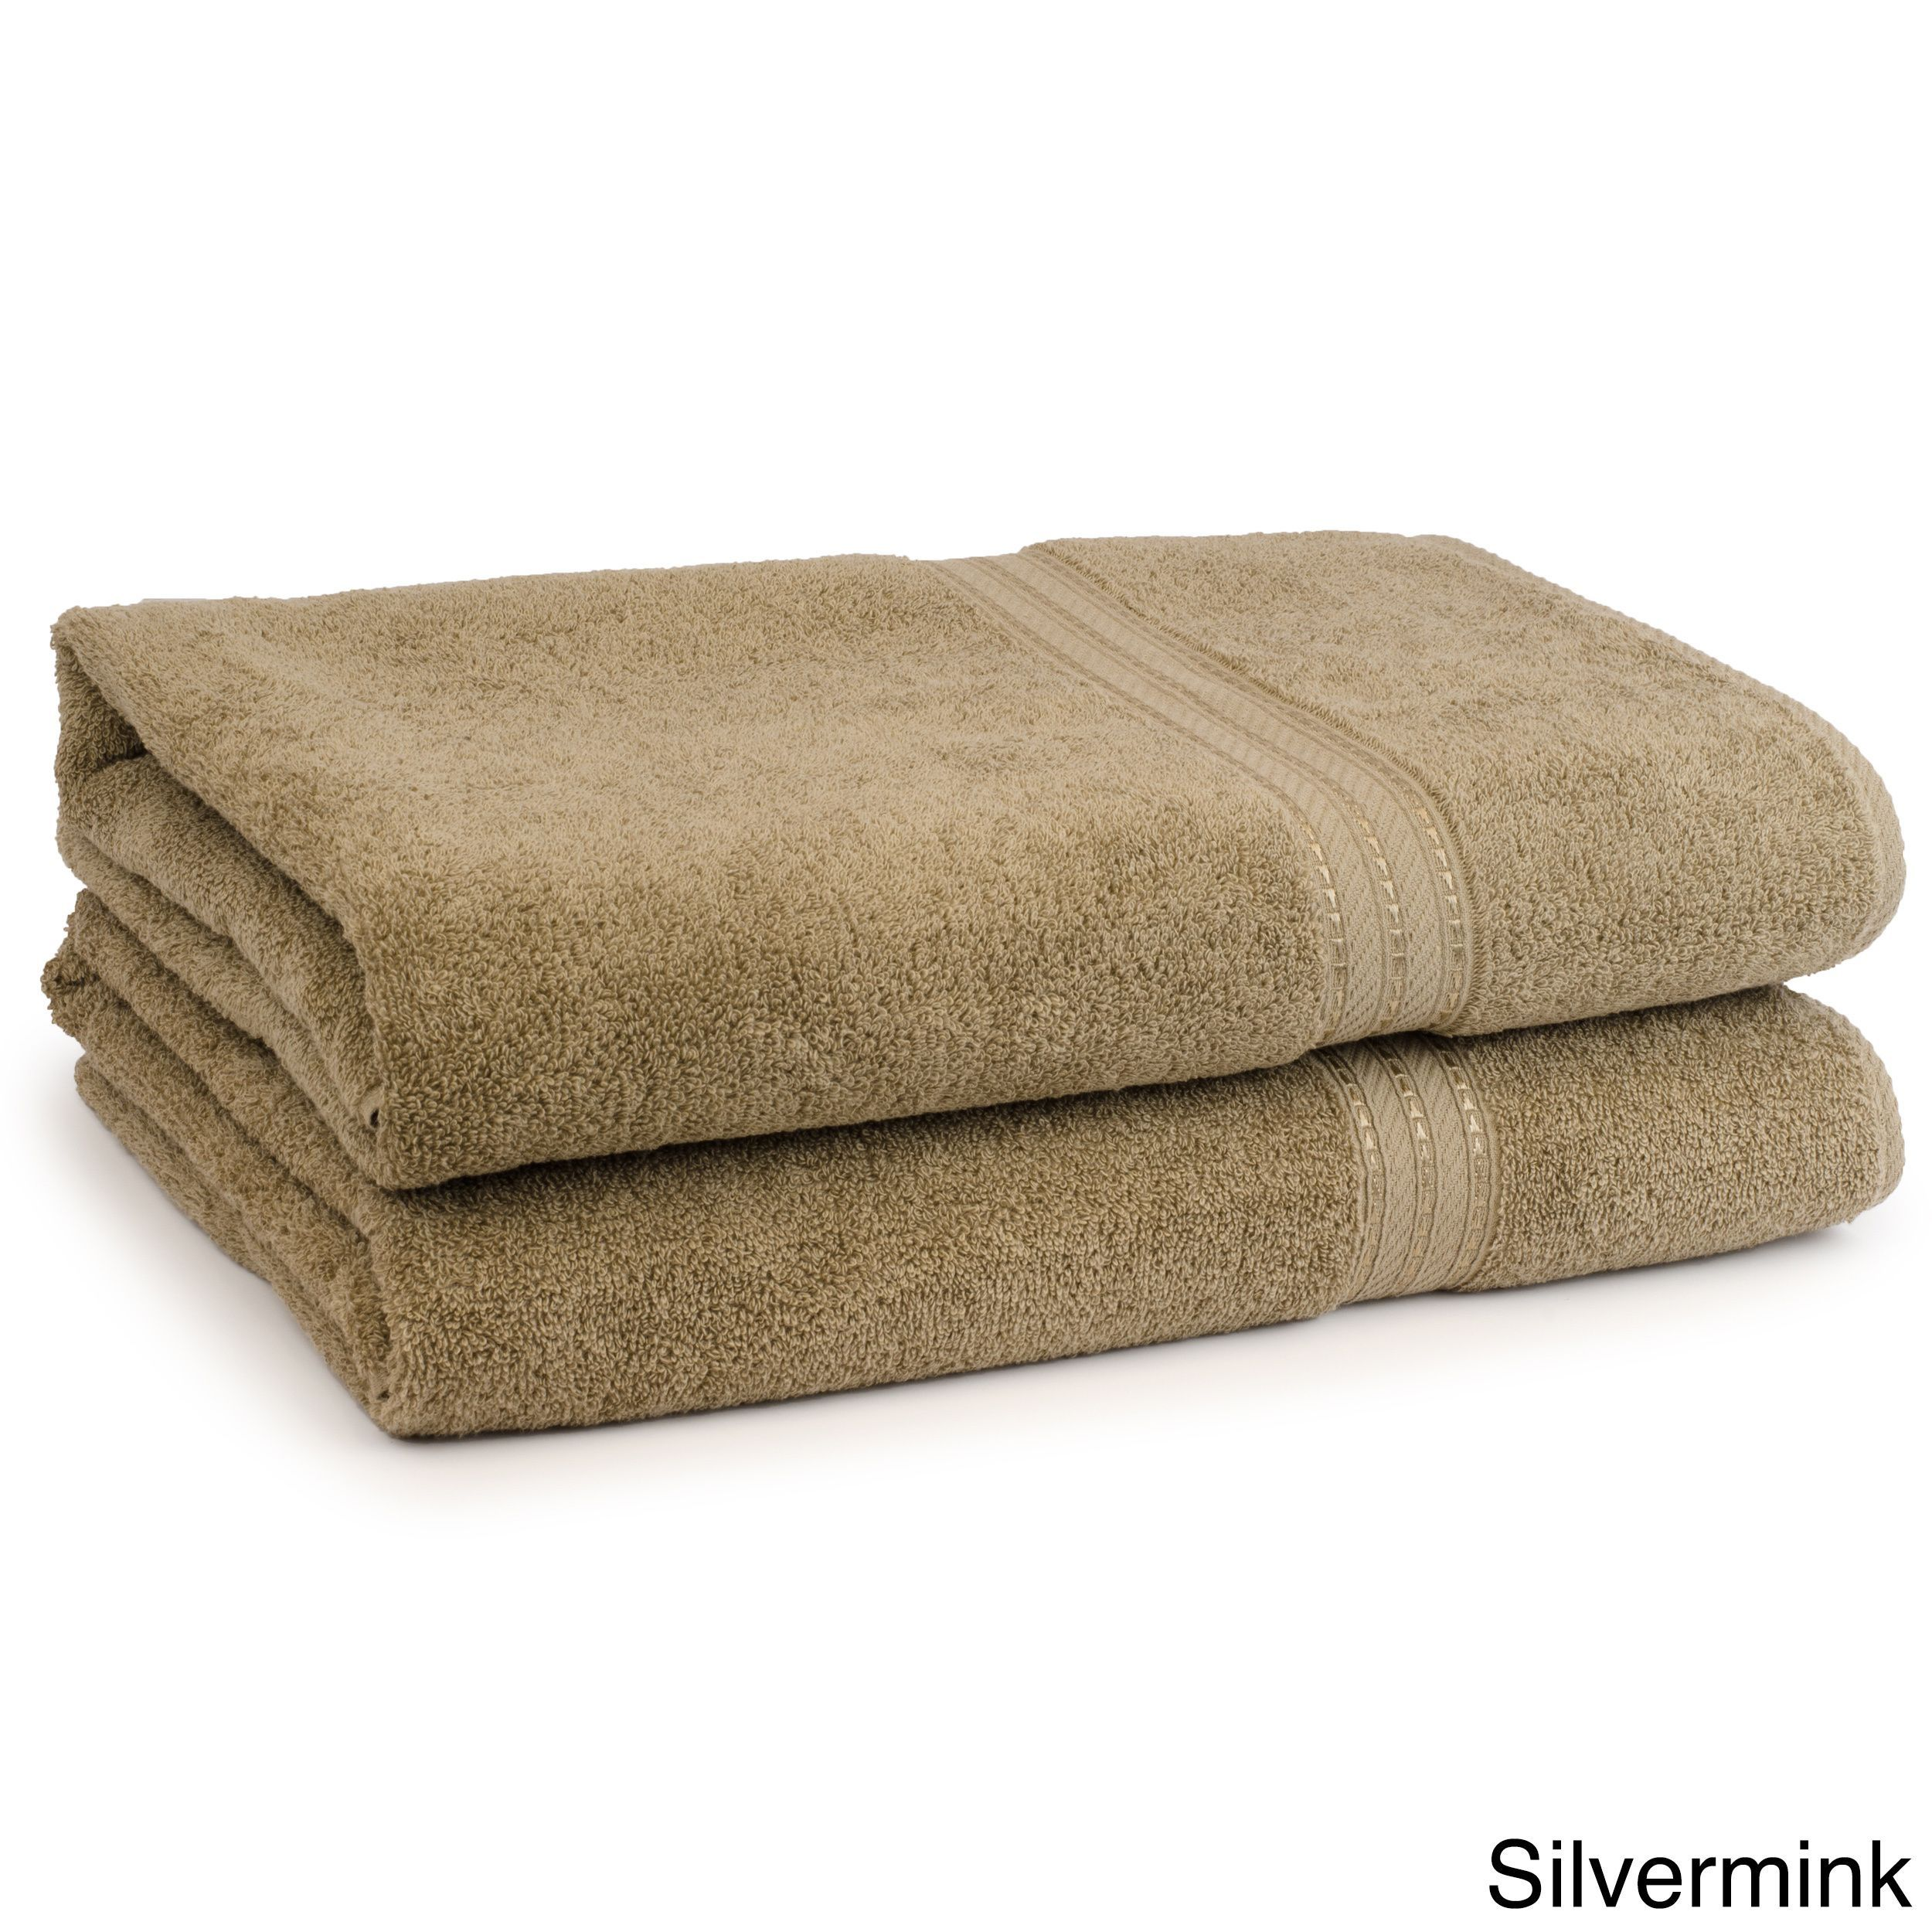 What Is A Bath Sheet Cambridge Towel Caldwell At Home Certified Giza Egyptian Bath Sheet